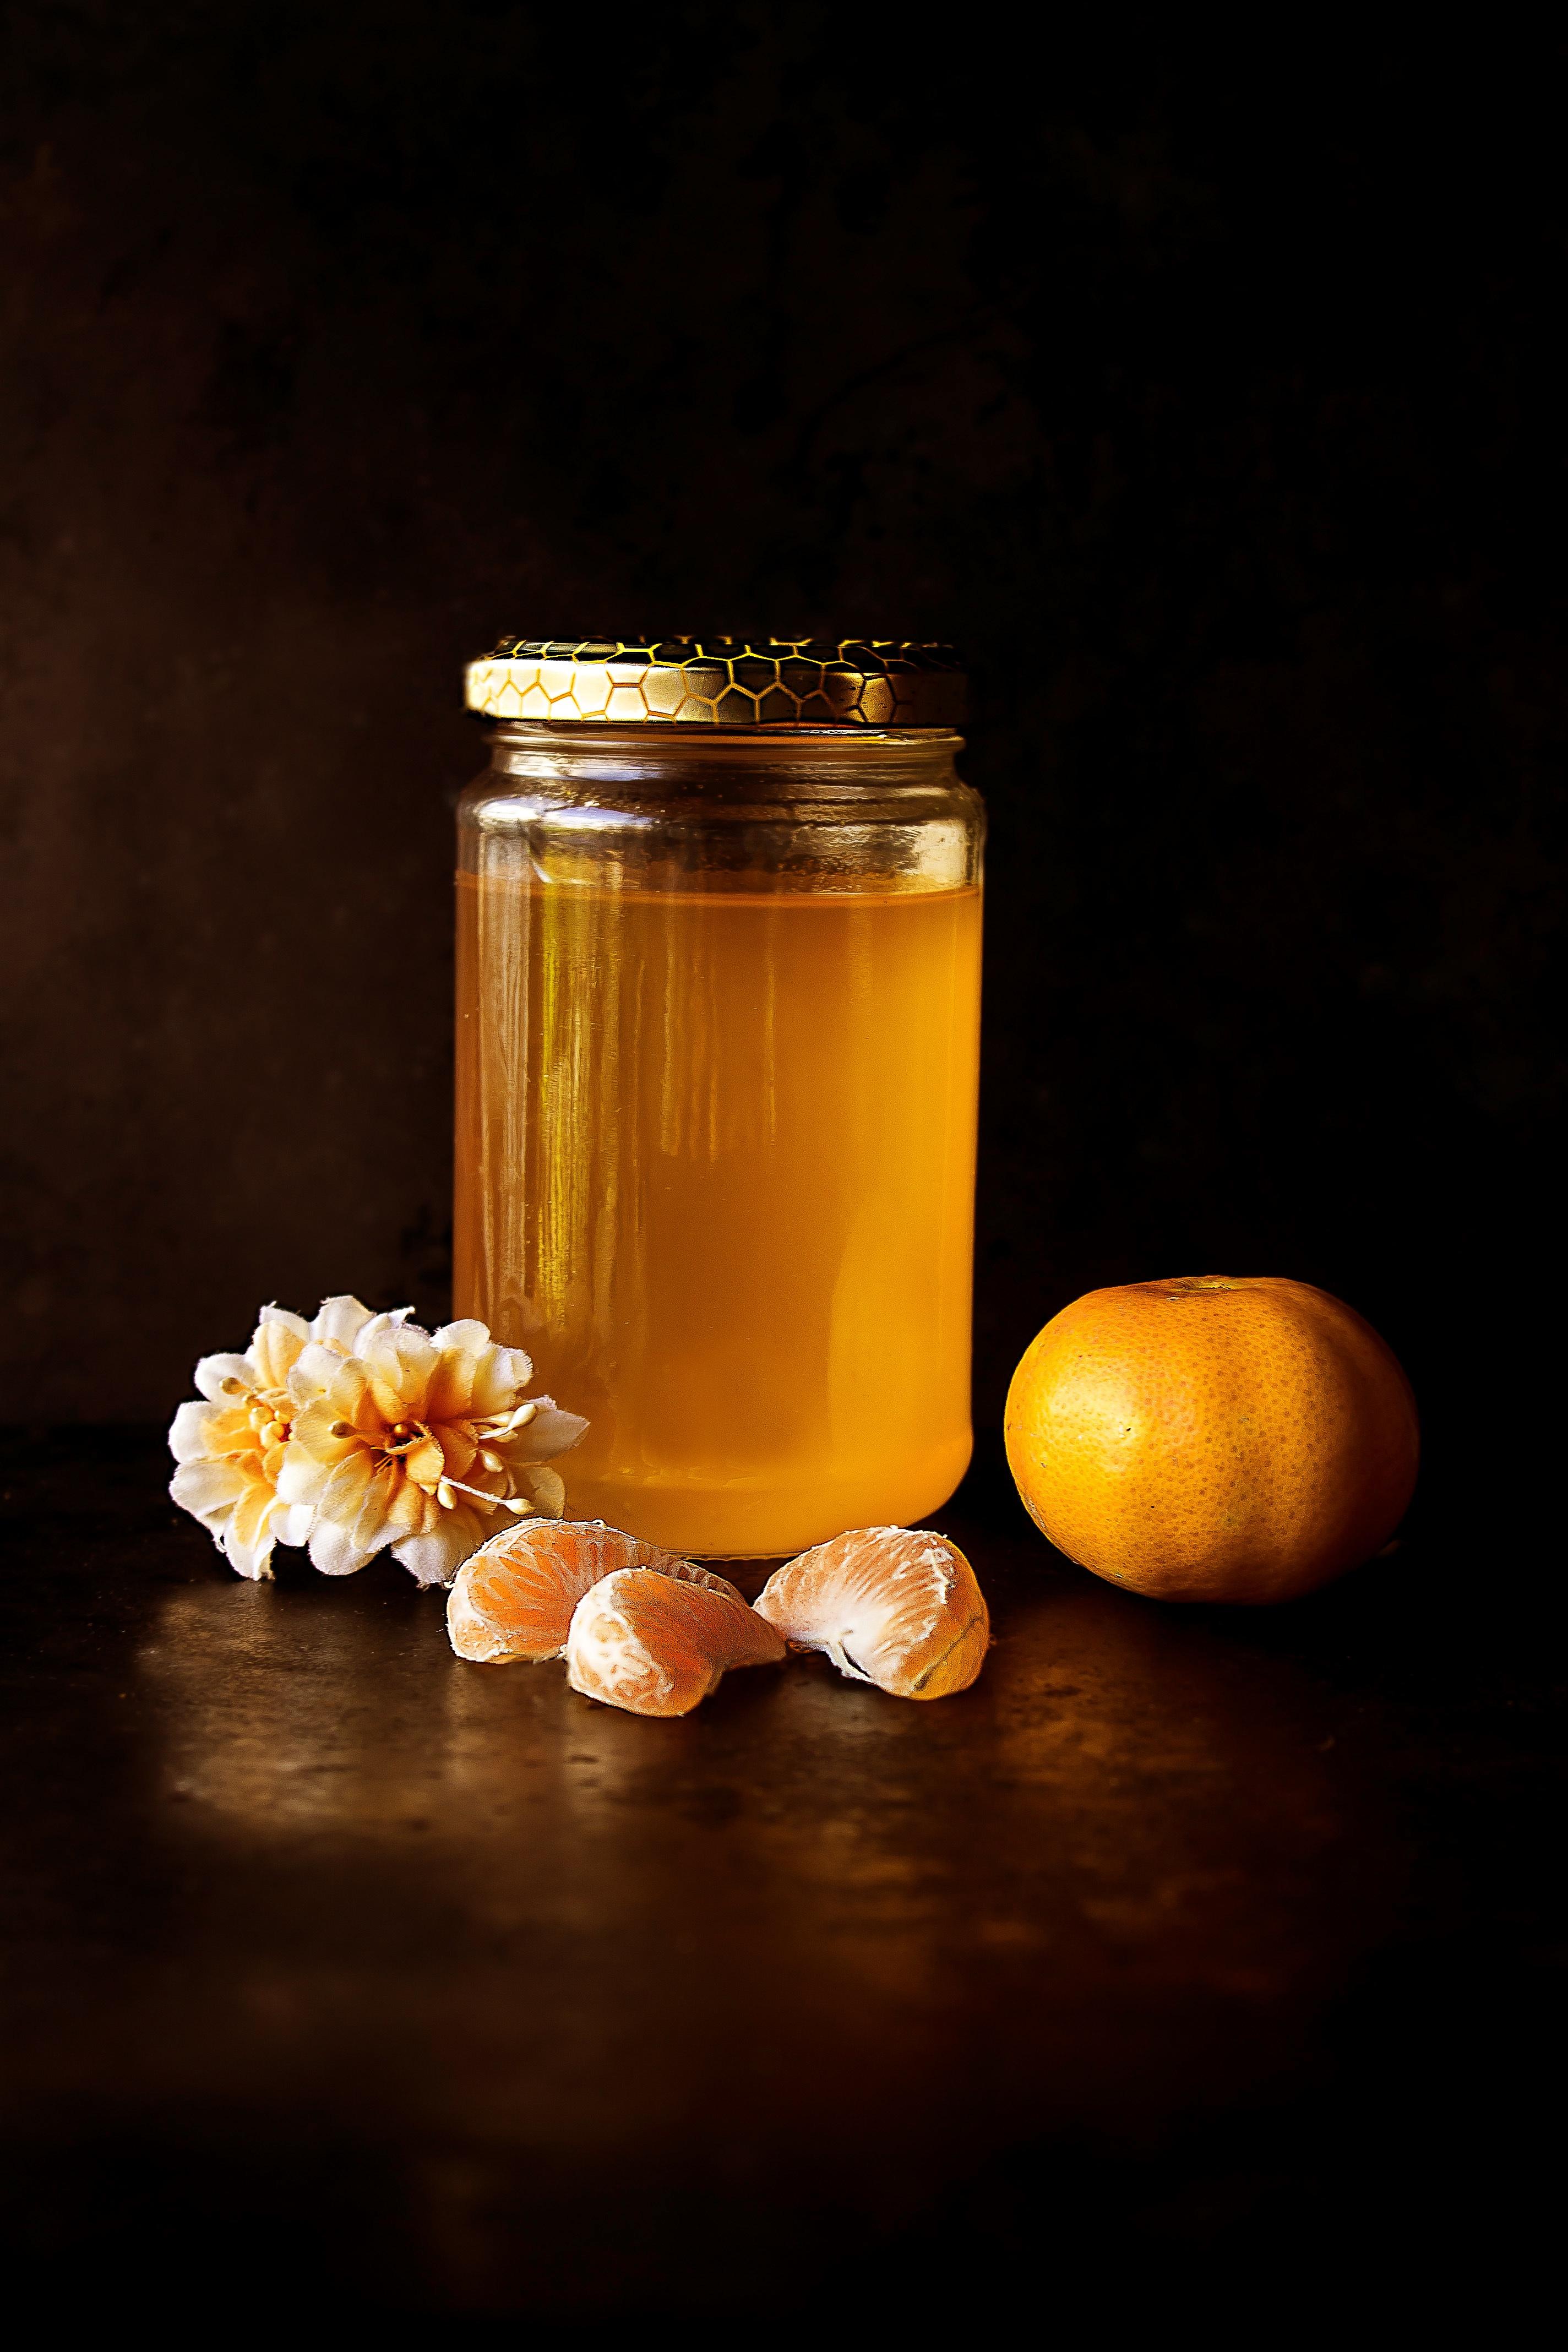 Plant Fruit Flower Honey Jar Orange Food Produce Yellow Candle Lighting Still Life Painting Macro Photography